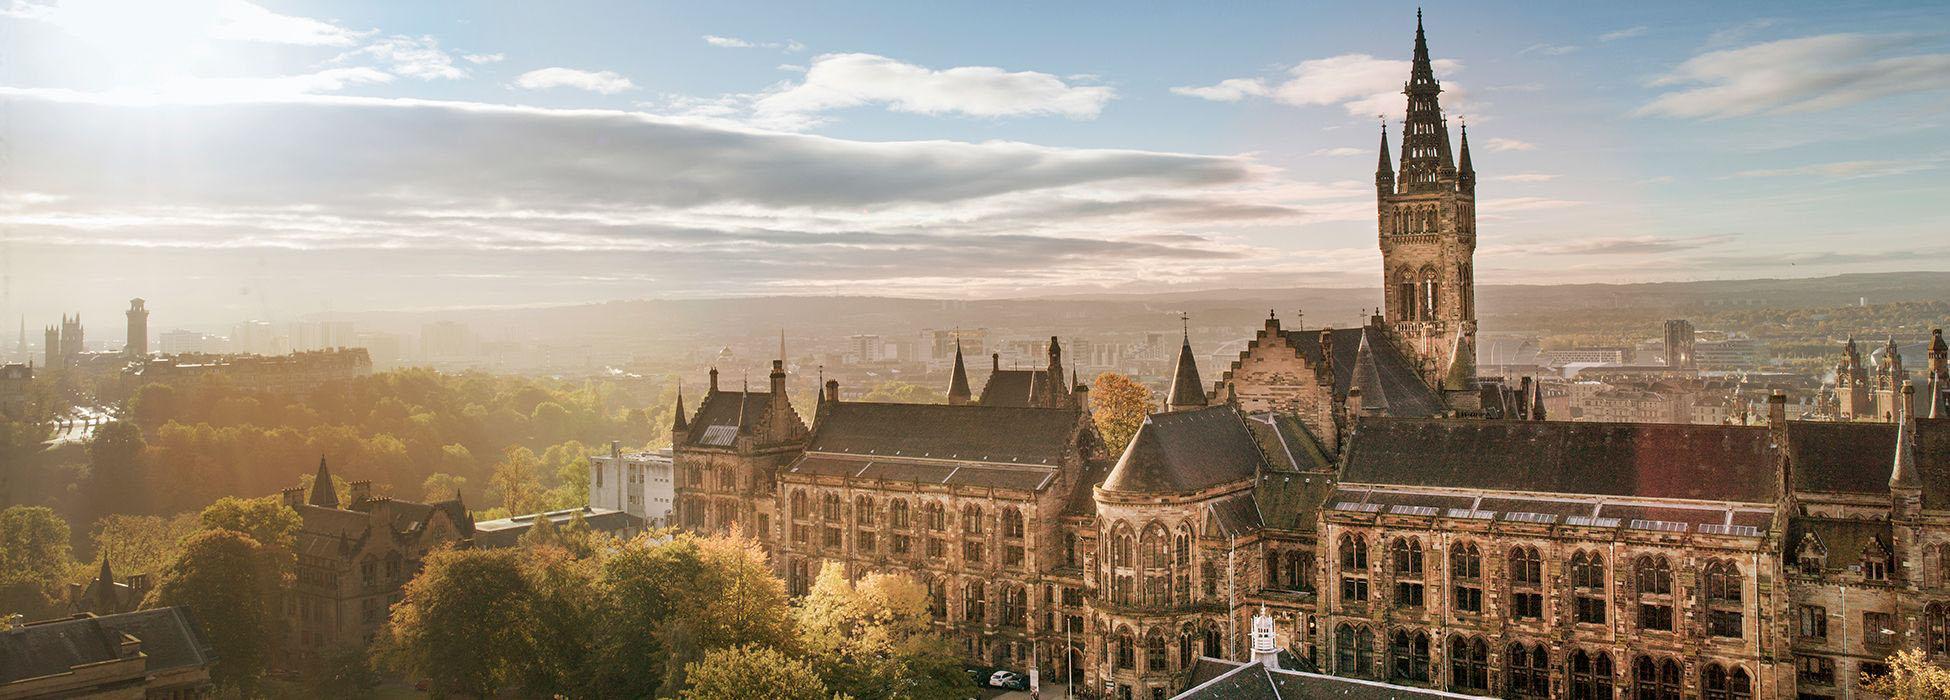 University of Glasgow   World University Rankings   THE